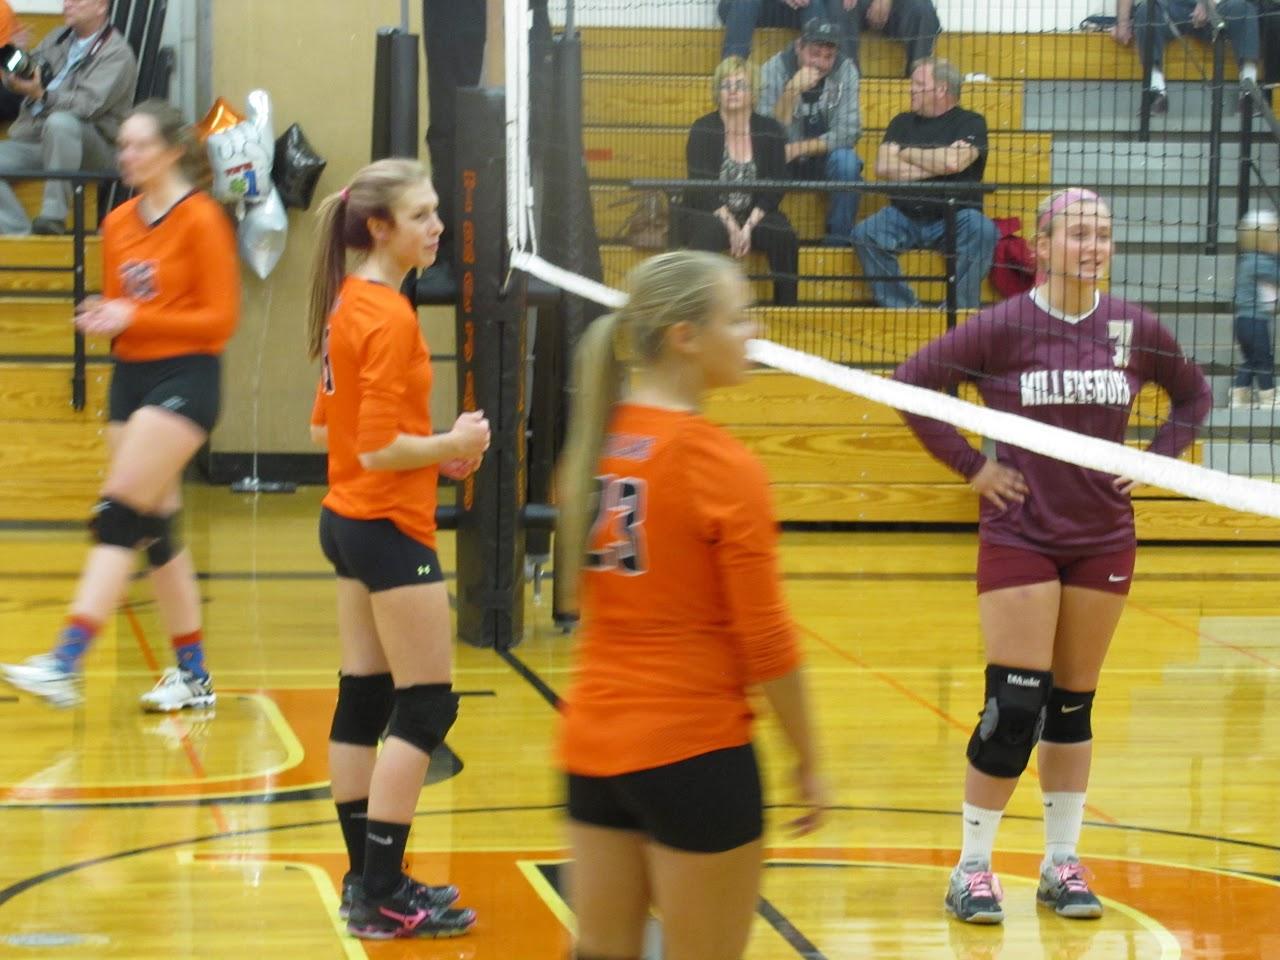 Volleyball-Millersburg vs UDA - IMG_7531.JPG